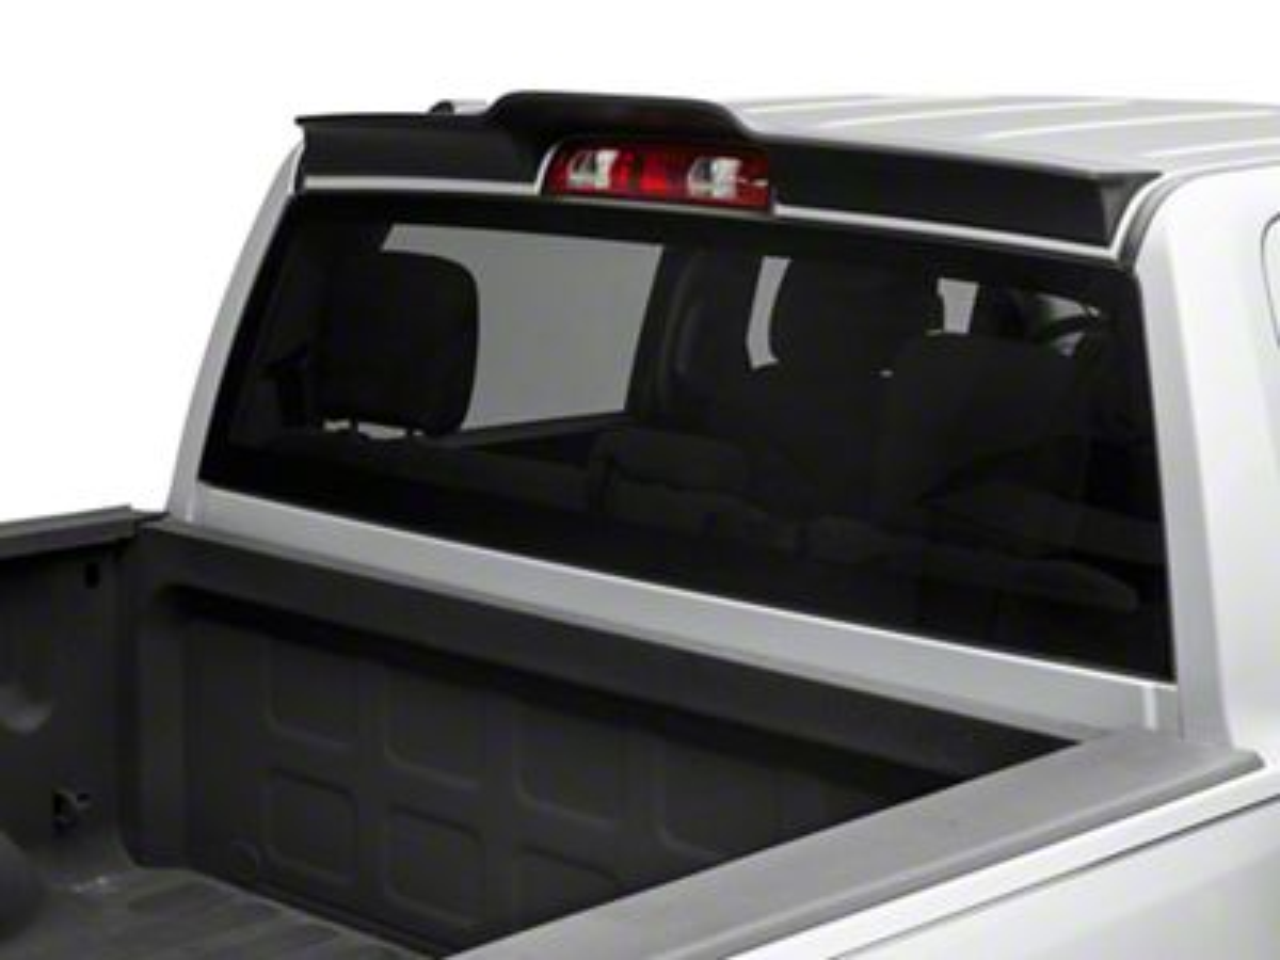 MMD Rear Truck Cab Spoiler - Matte Black (09-18 RAM 1500)